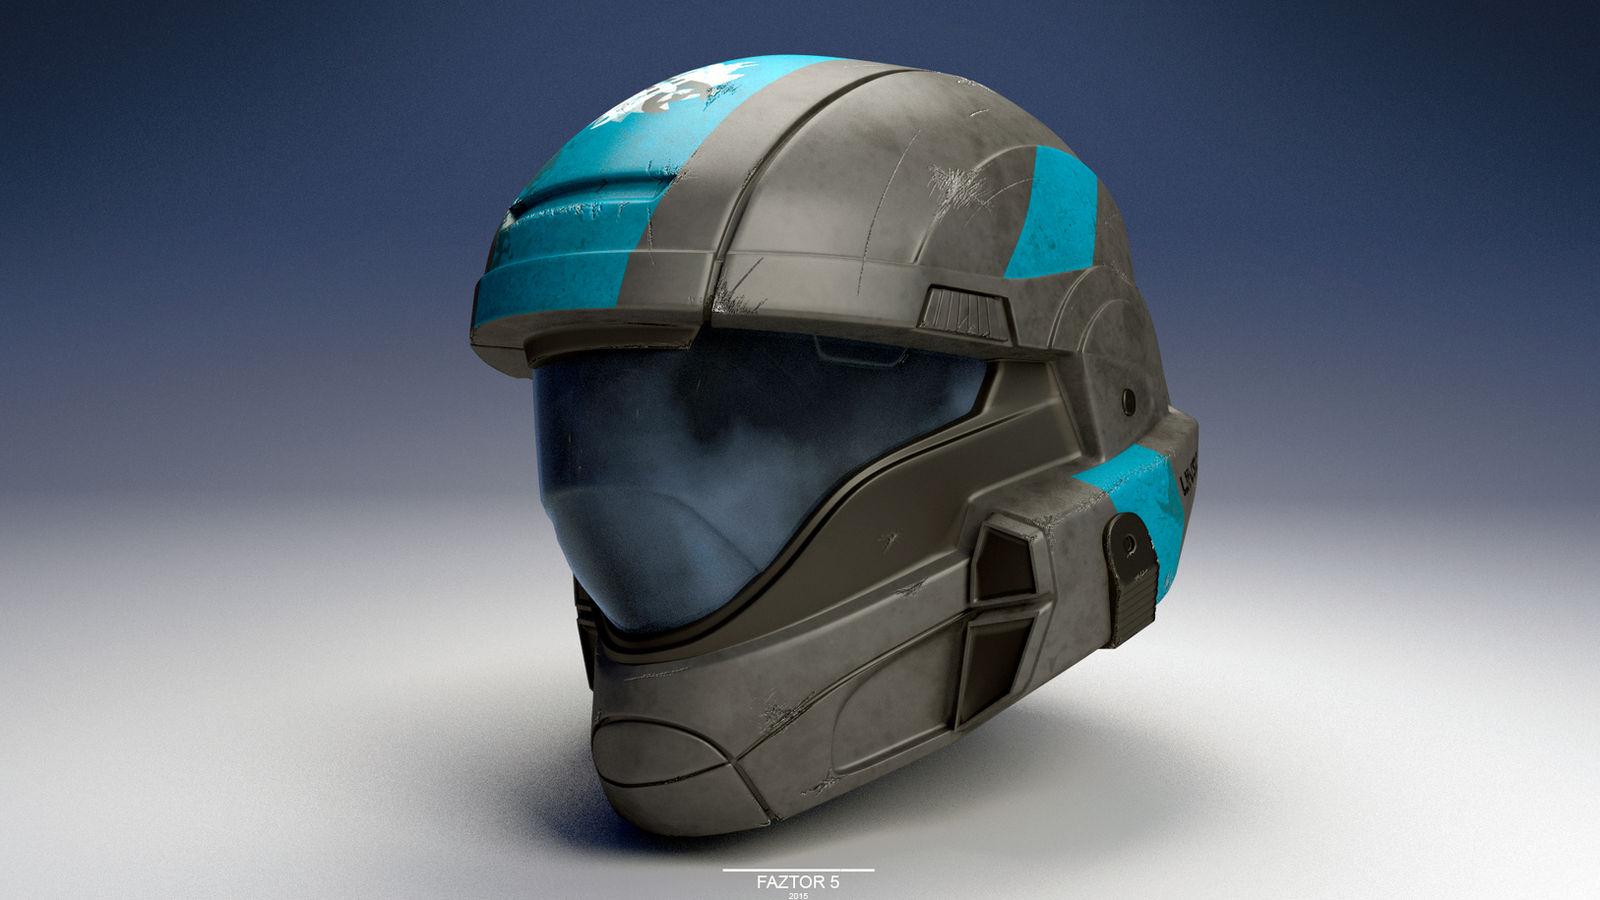 ODST Helmet (Halo) by Faztor5 on DeviantArt